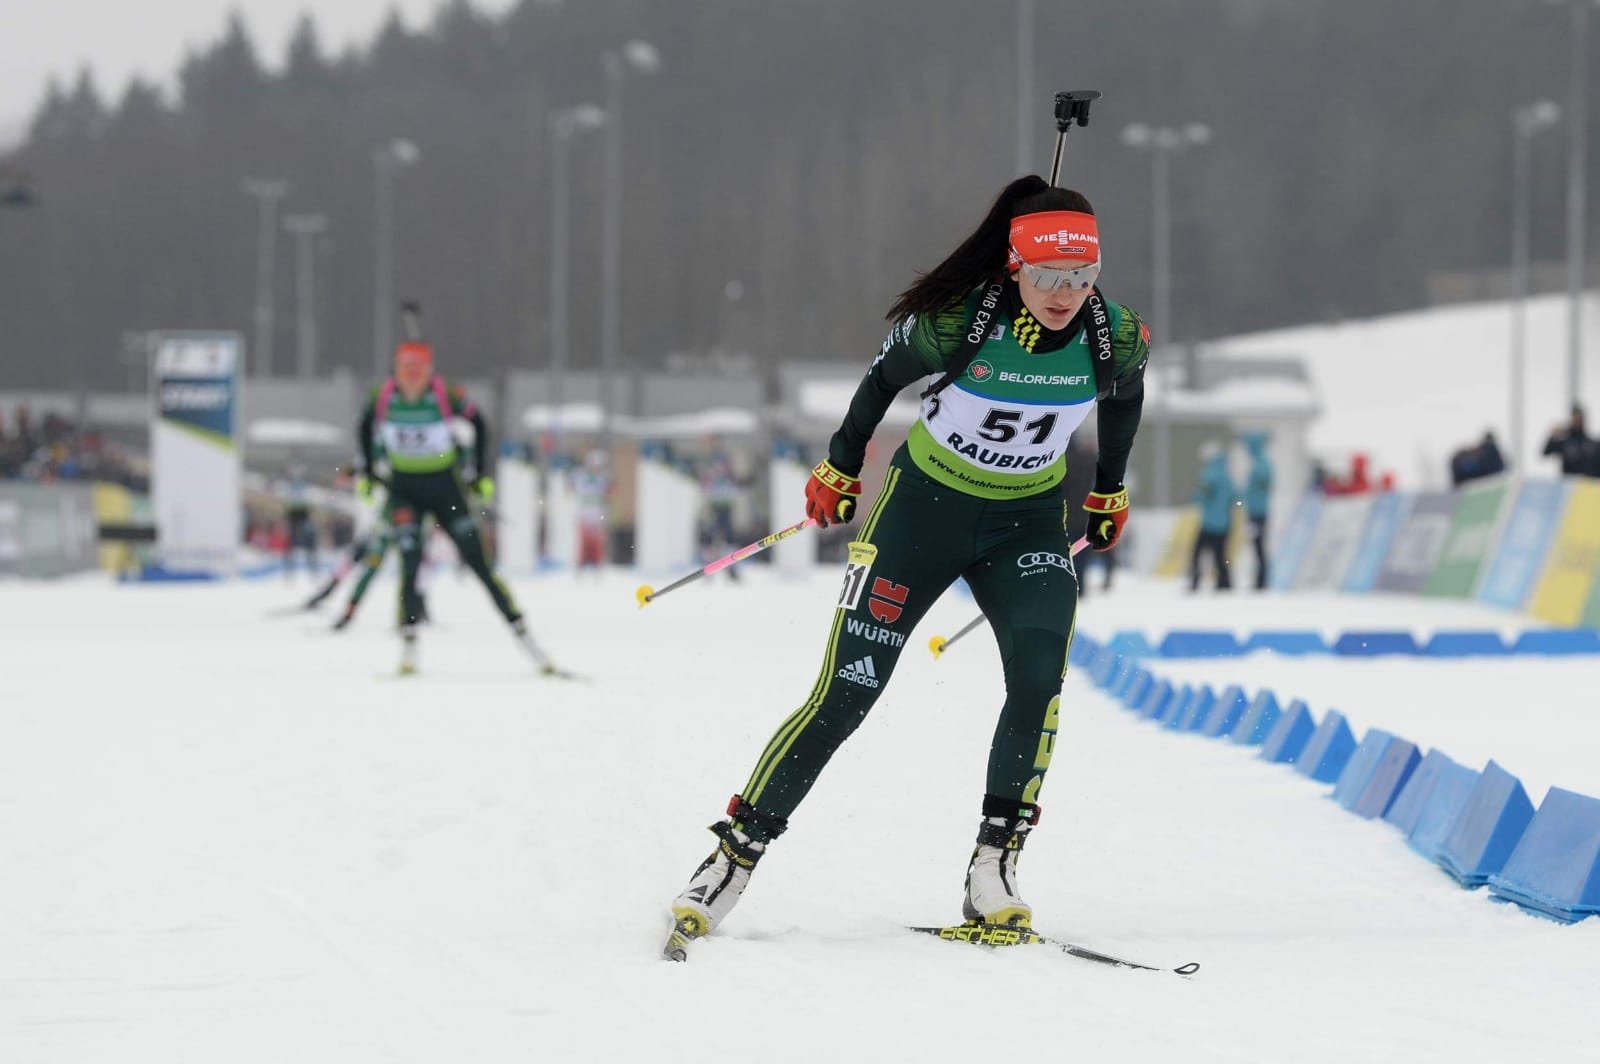 Biathlon EM – Juliane Frühwirt sammelt erste Erfahrungen bei den Damen